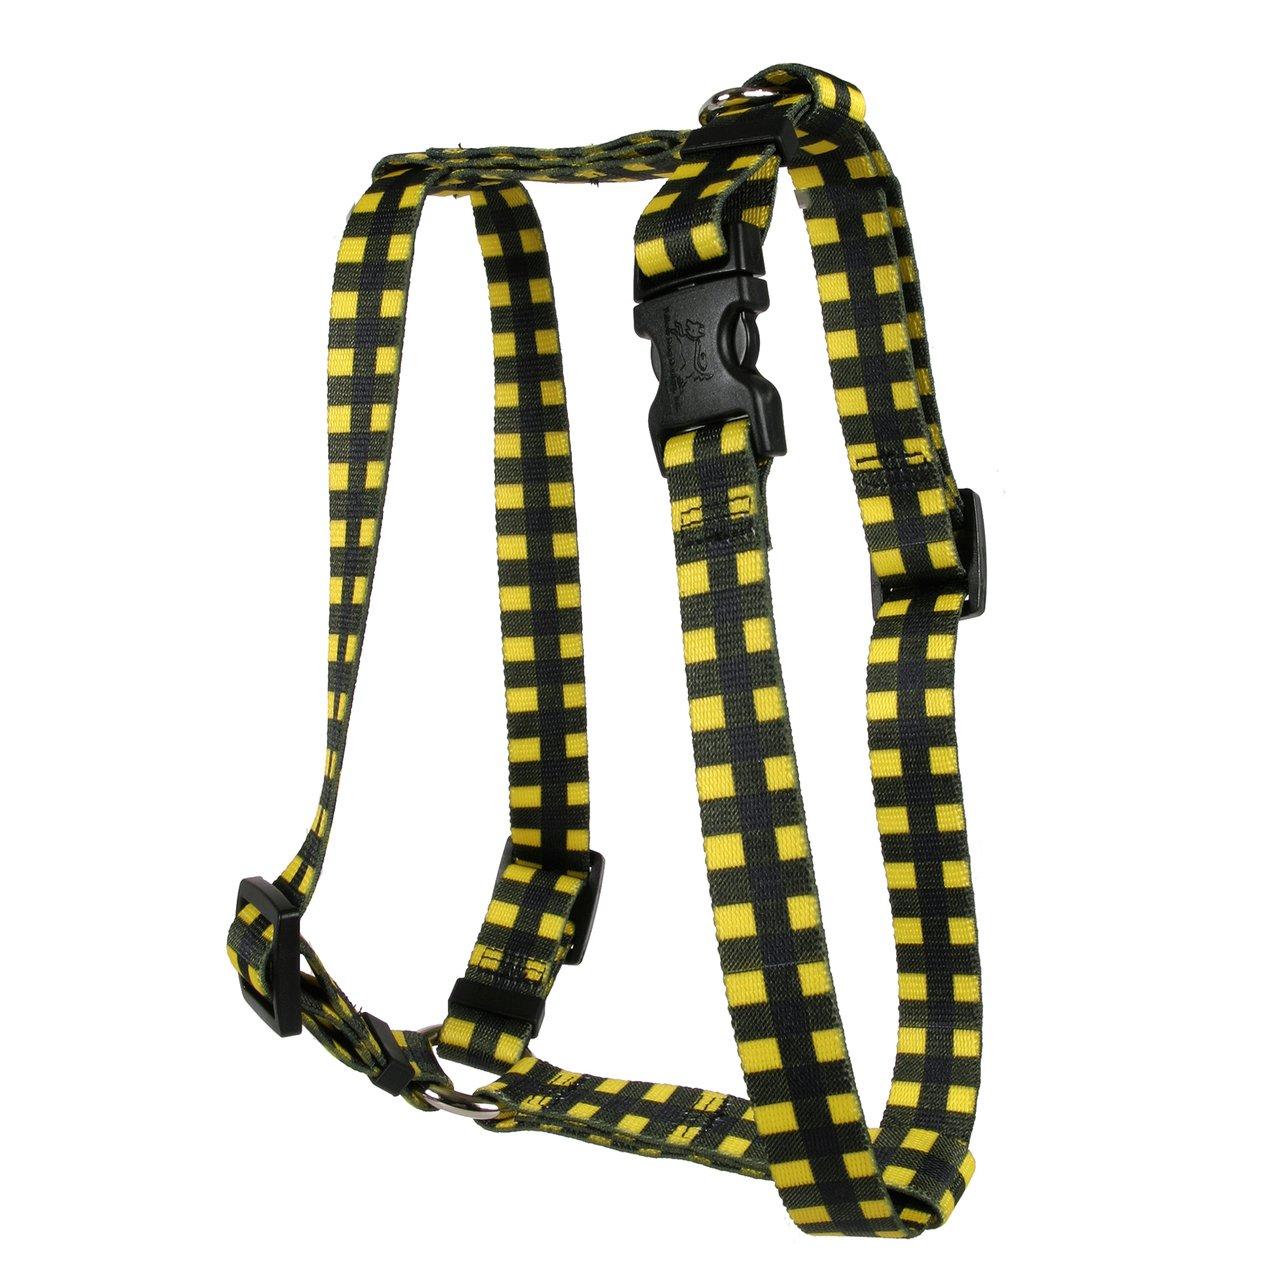 Yellow Dog Design Buffalo Plaid Yellow Roman Style H Dog Harness, X-Large/1'' Wide by Yellow Dog Design (Image #1)